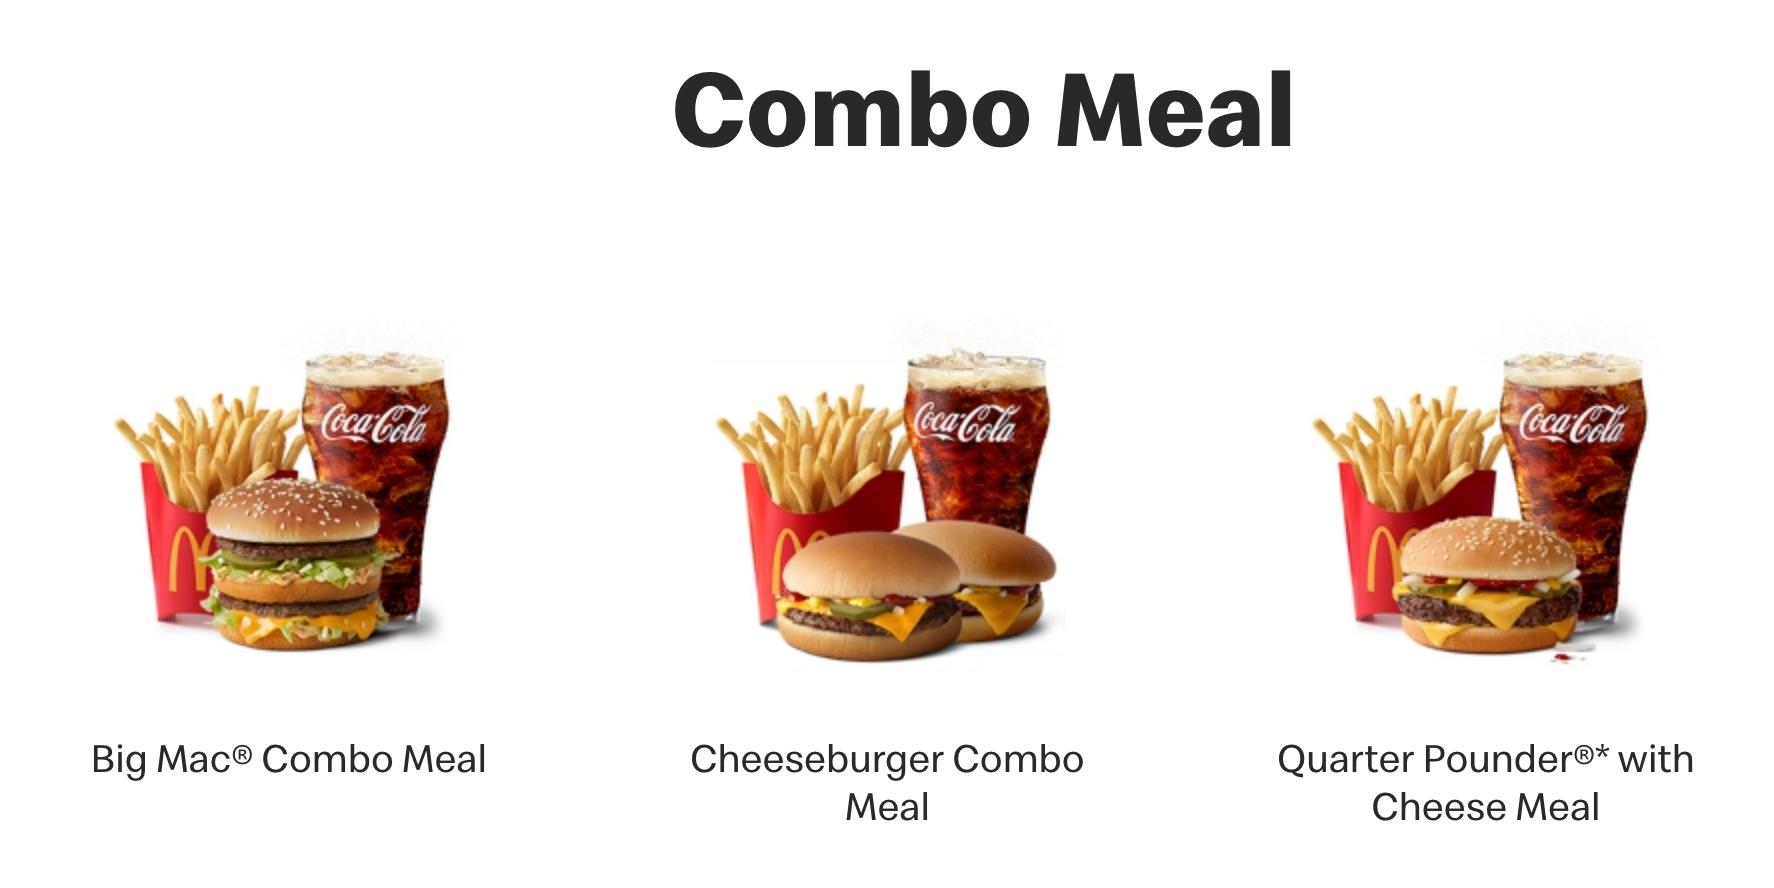 Bundle Pricing Strategy: McDonald's